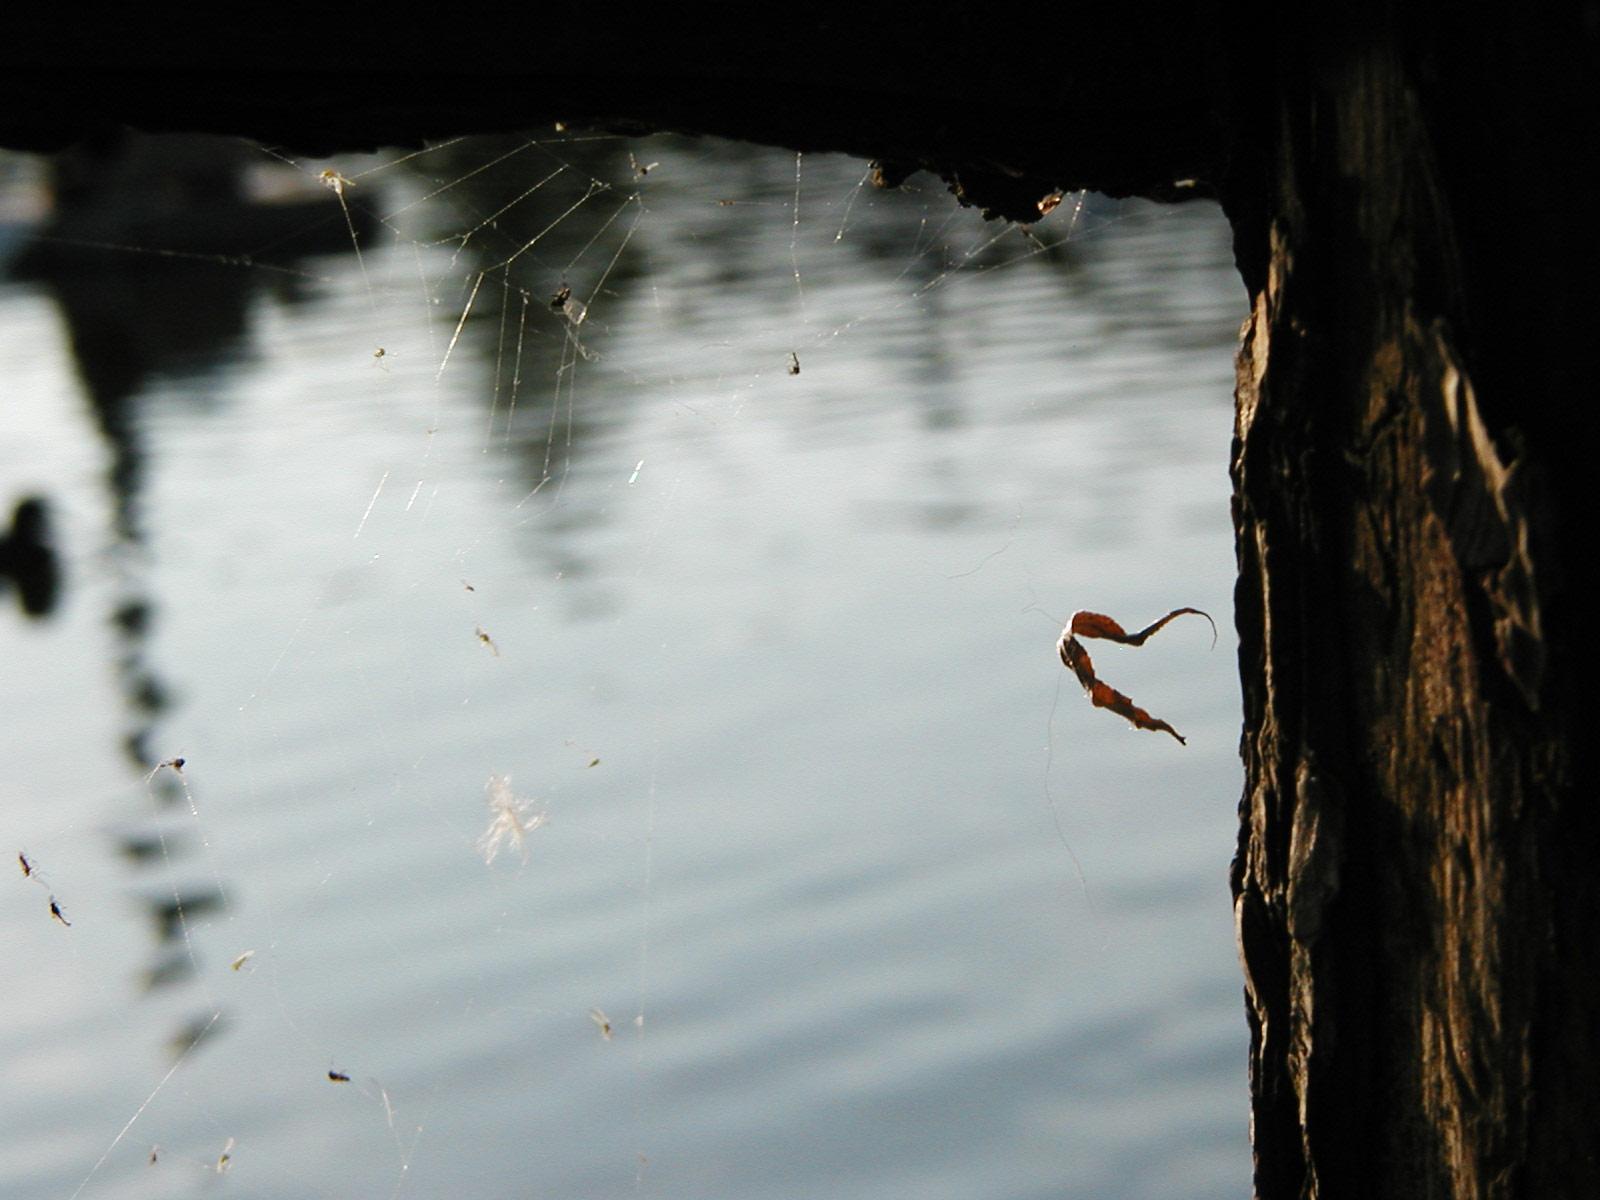 Spiderweb on tree, Park, Pond, Spider, Tree, HQ Photo